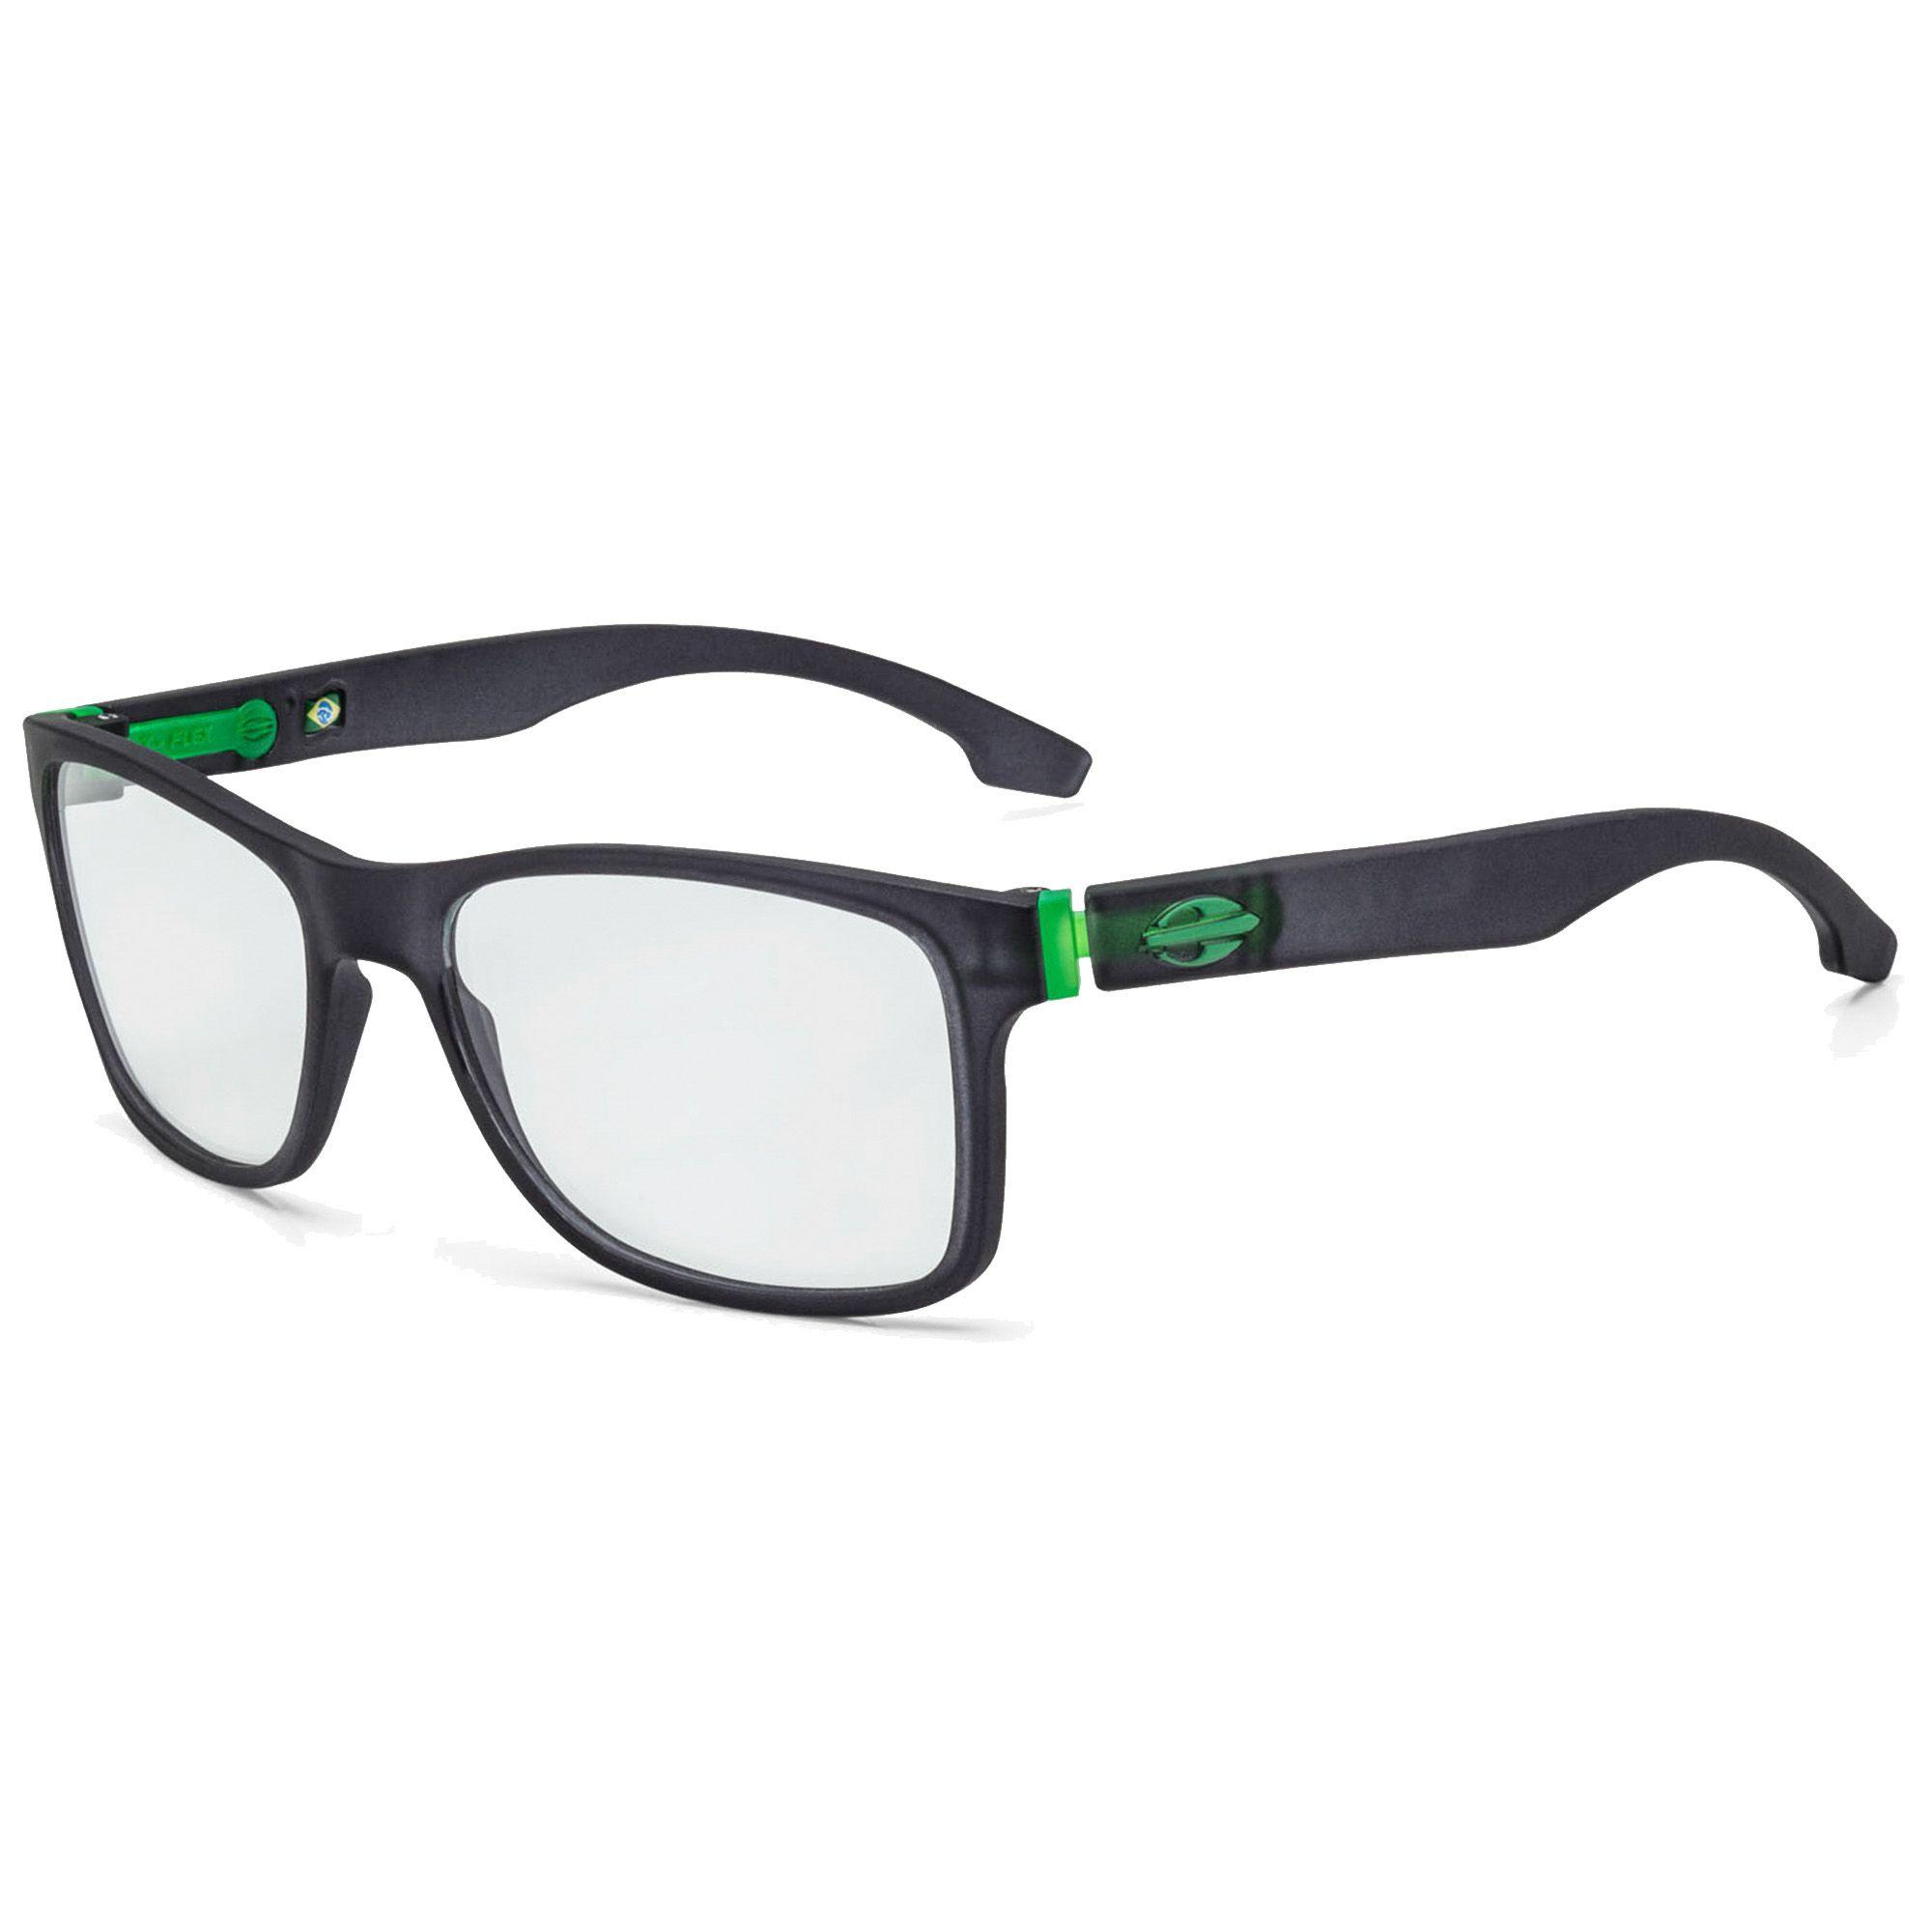 Óculos de Grau Unissex Mormaii Califa M6047D6356